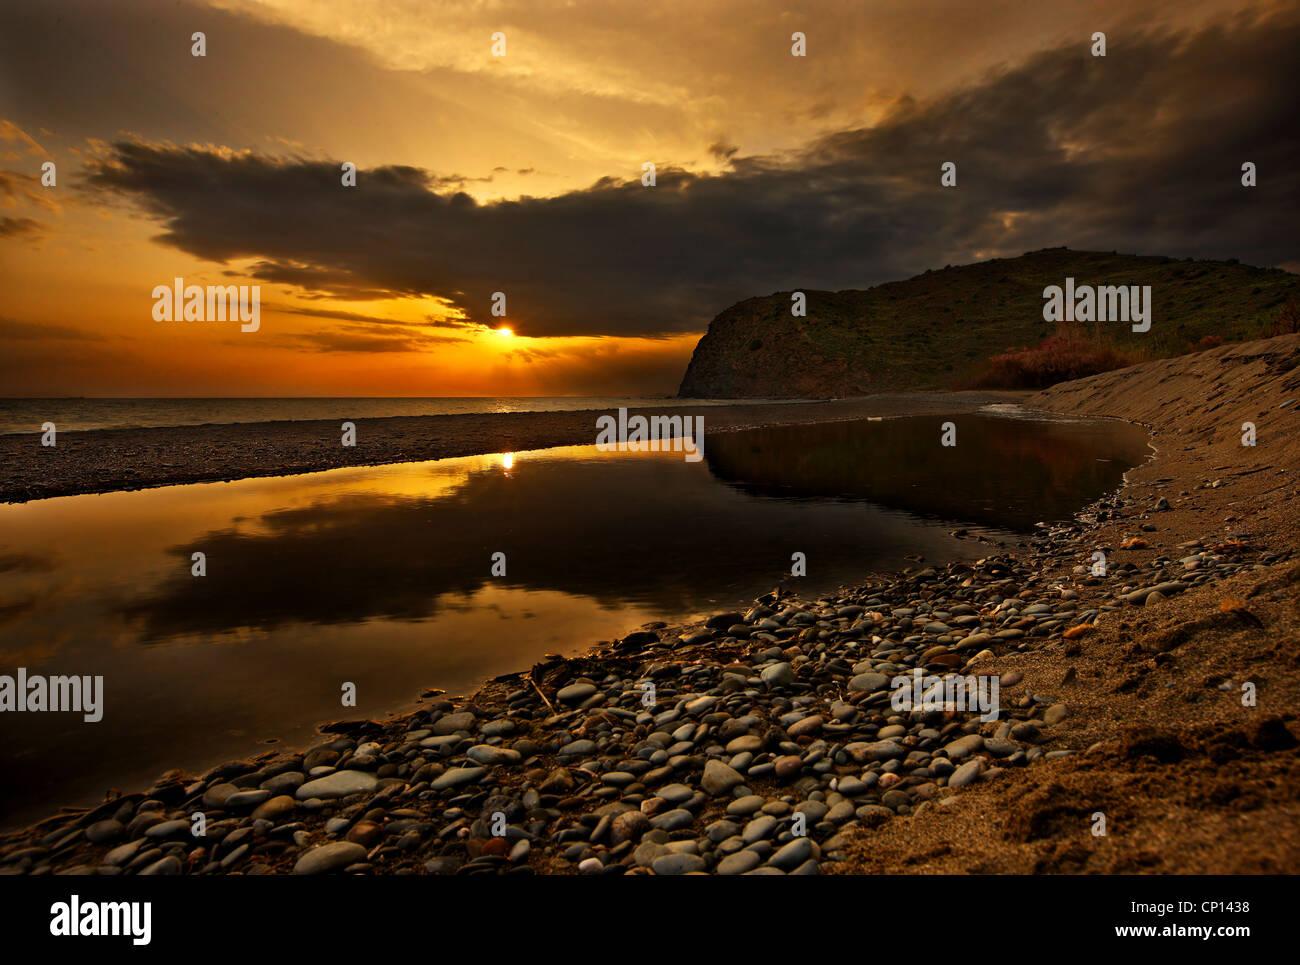 Sunset at Agia Markella beach, close to Volissos, Chios island, Northeast Aegean, Greece - Stock Image